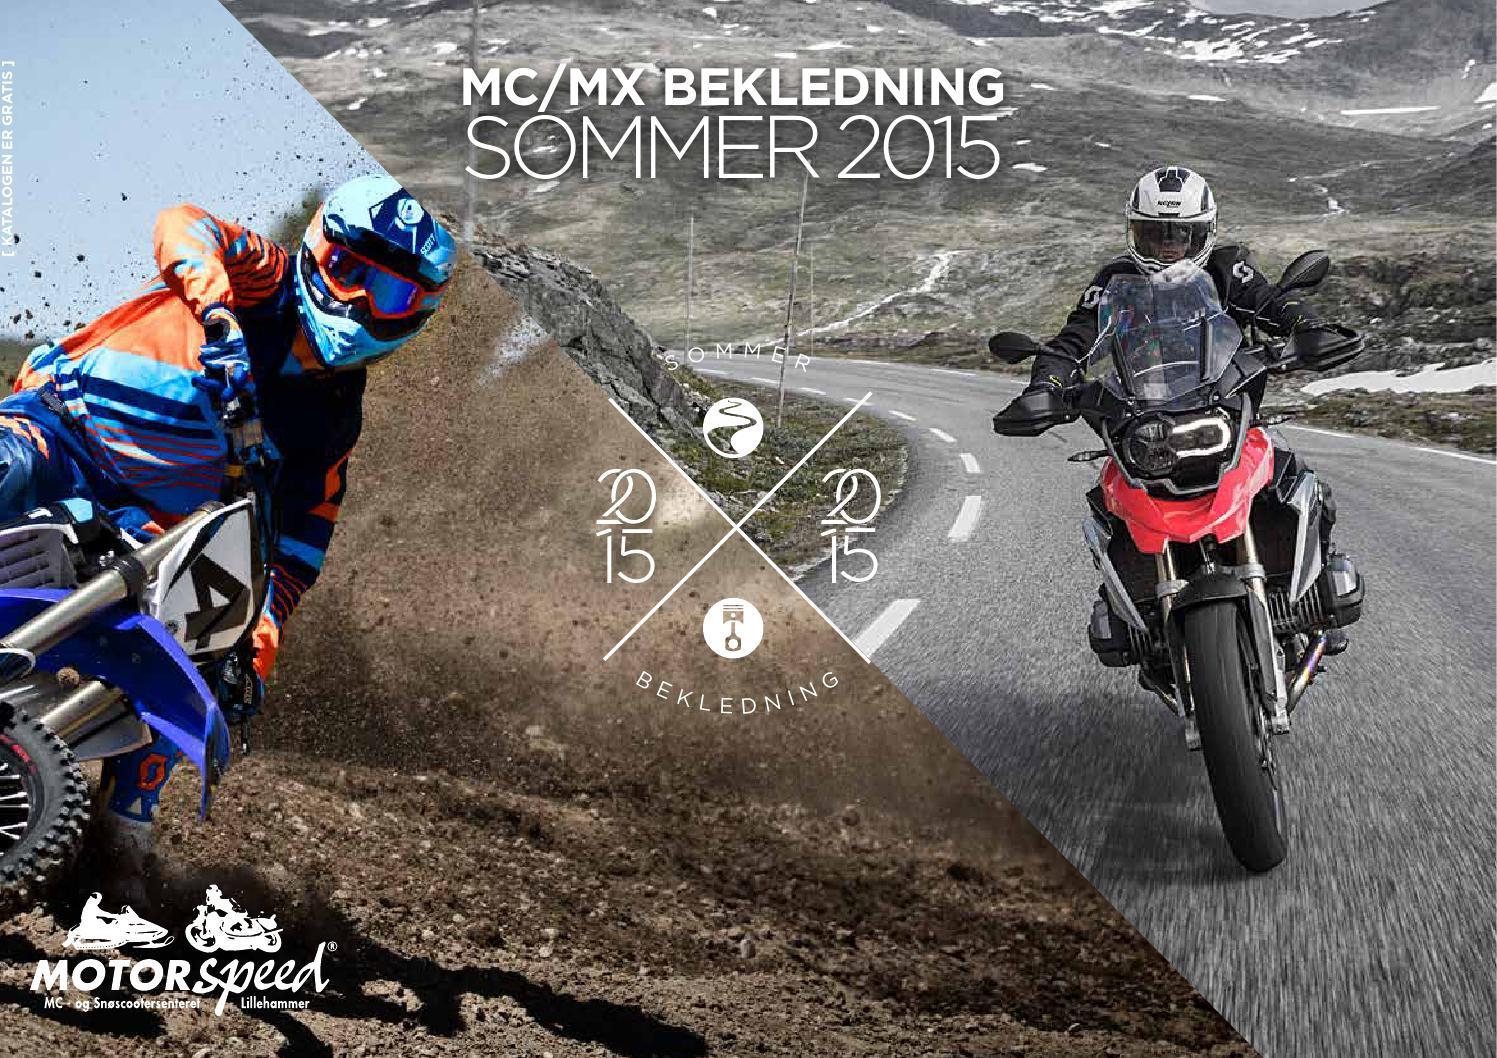 39a7e2fc6 Motorspeed - MC/MX Bekledning Sommer 2015 by Motorspeed AS - issuu